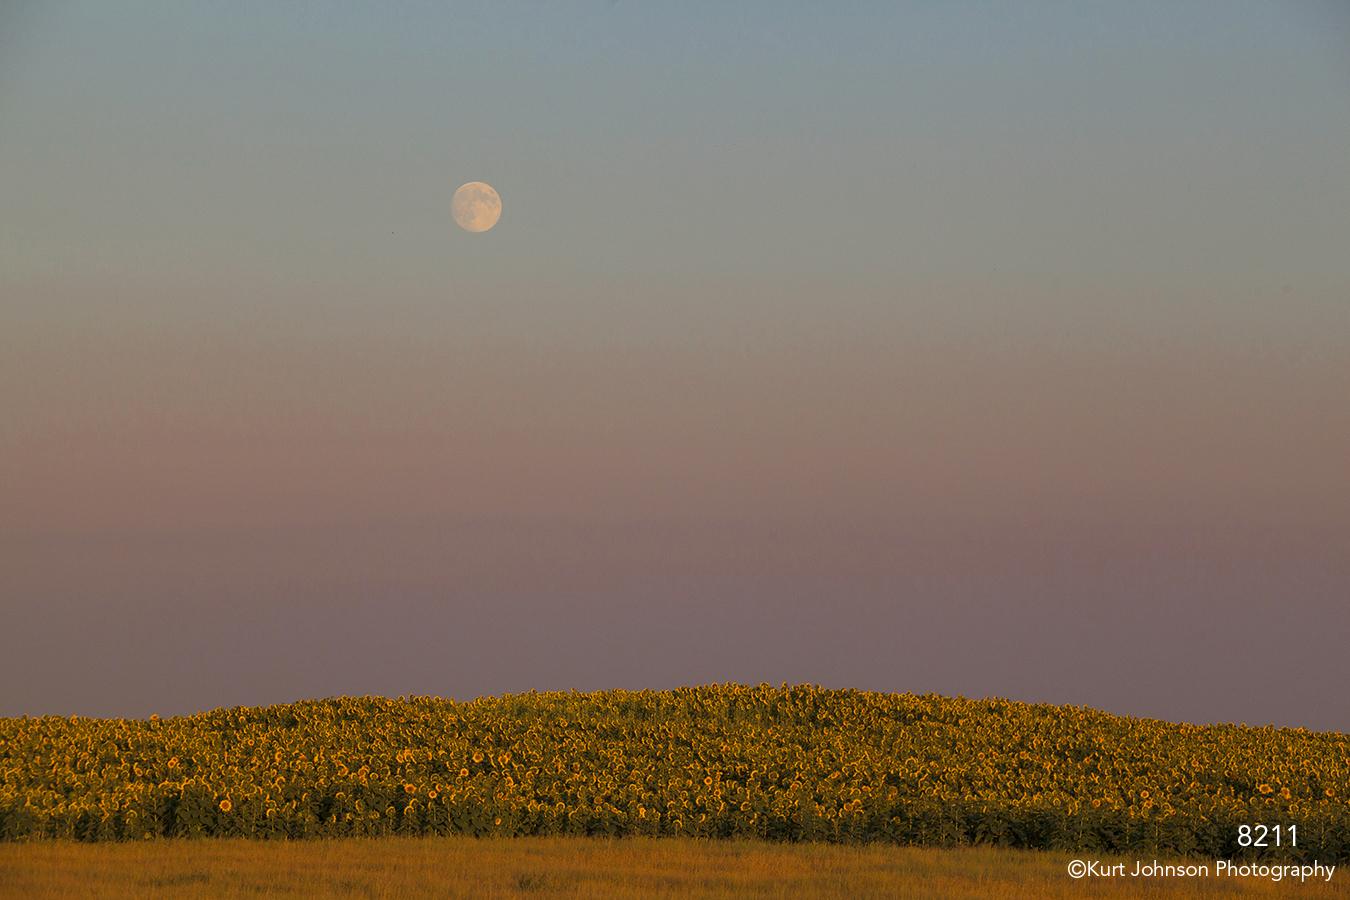 landscape sunflowers moon midwest sunset